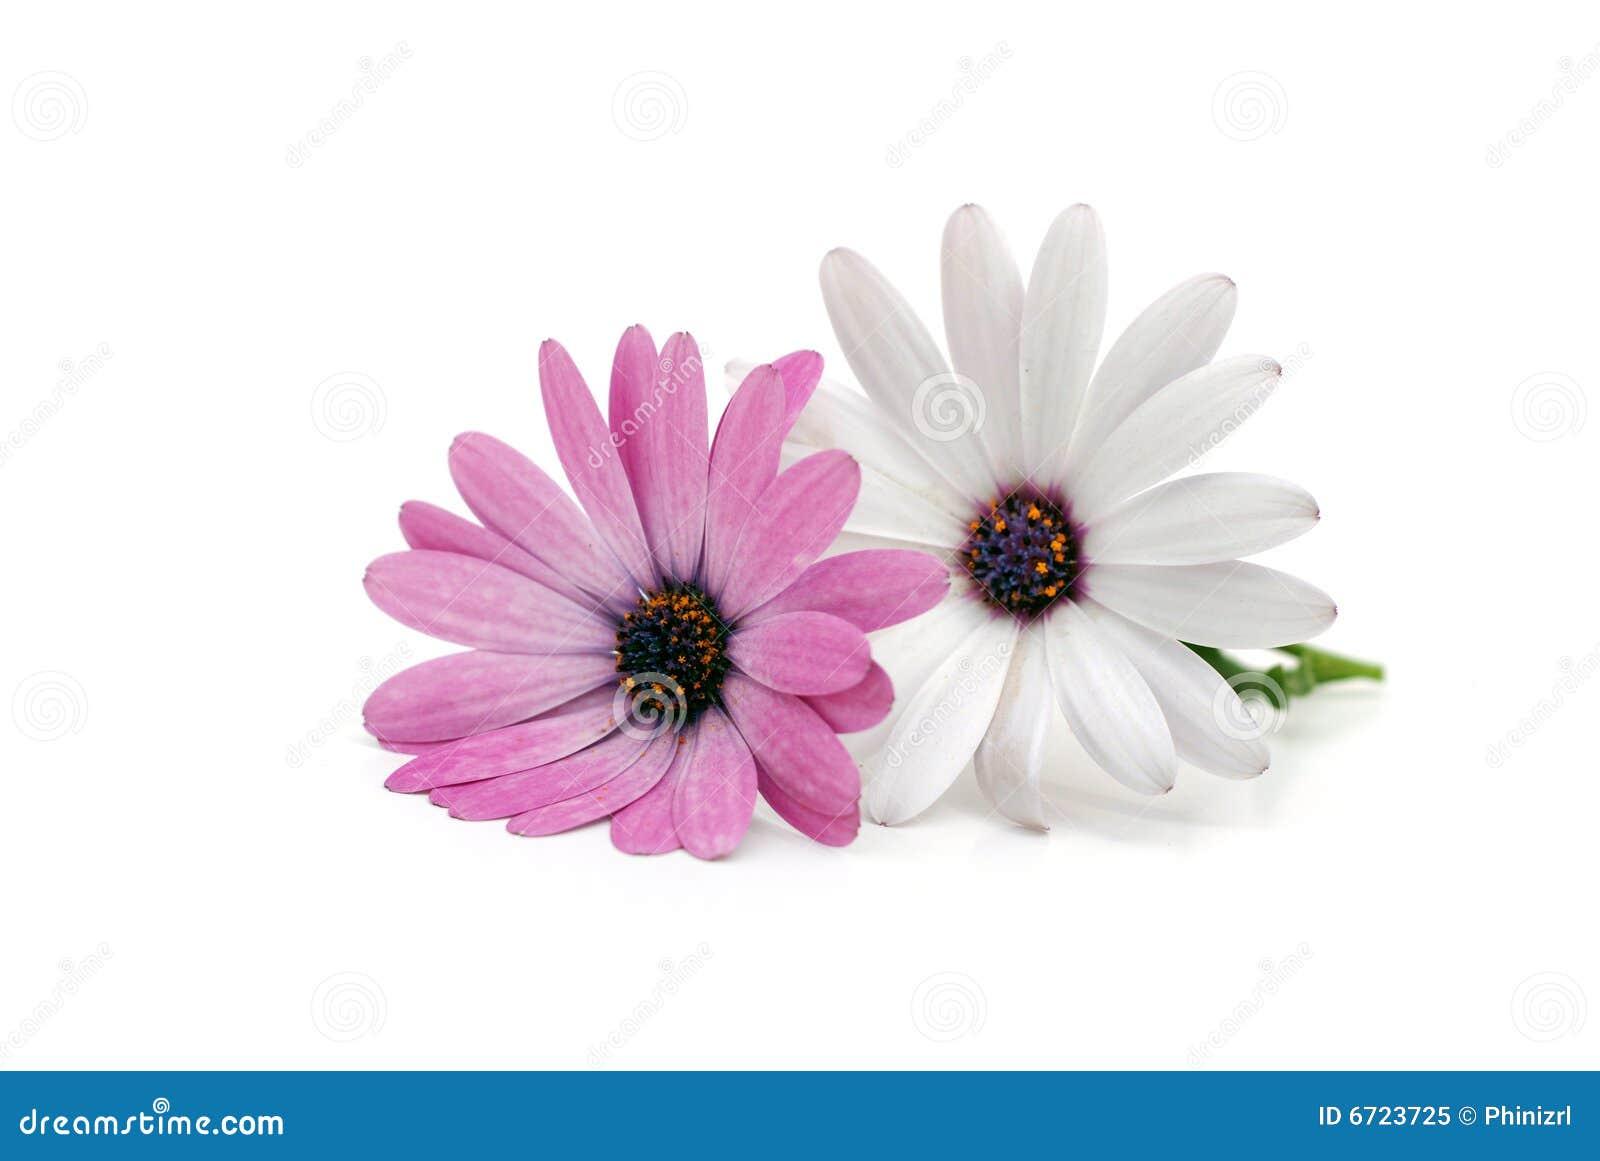 Double daisy stock image image of stem single season 6723725 double daisy izmirmasajfo Image collections